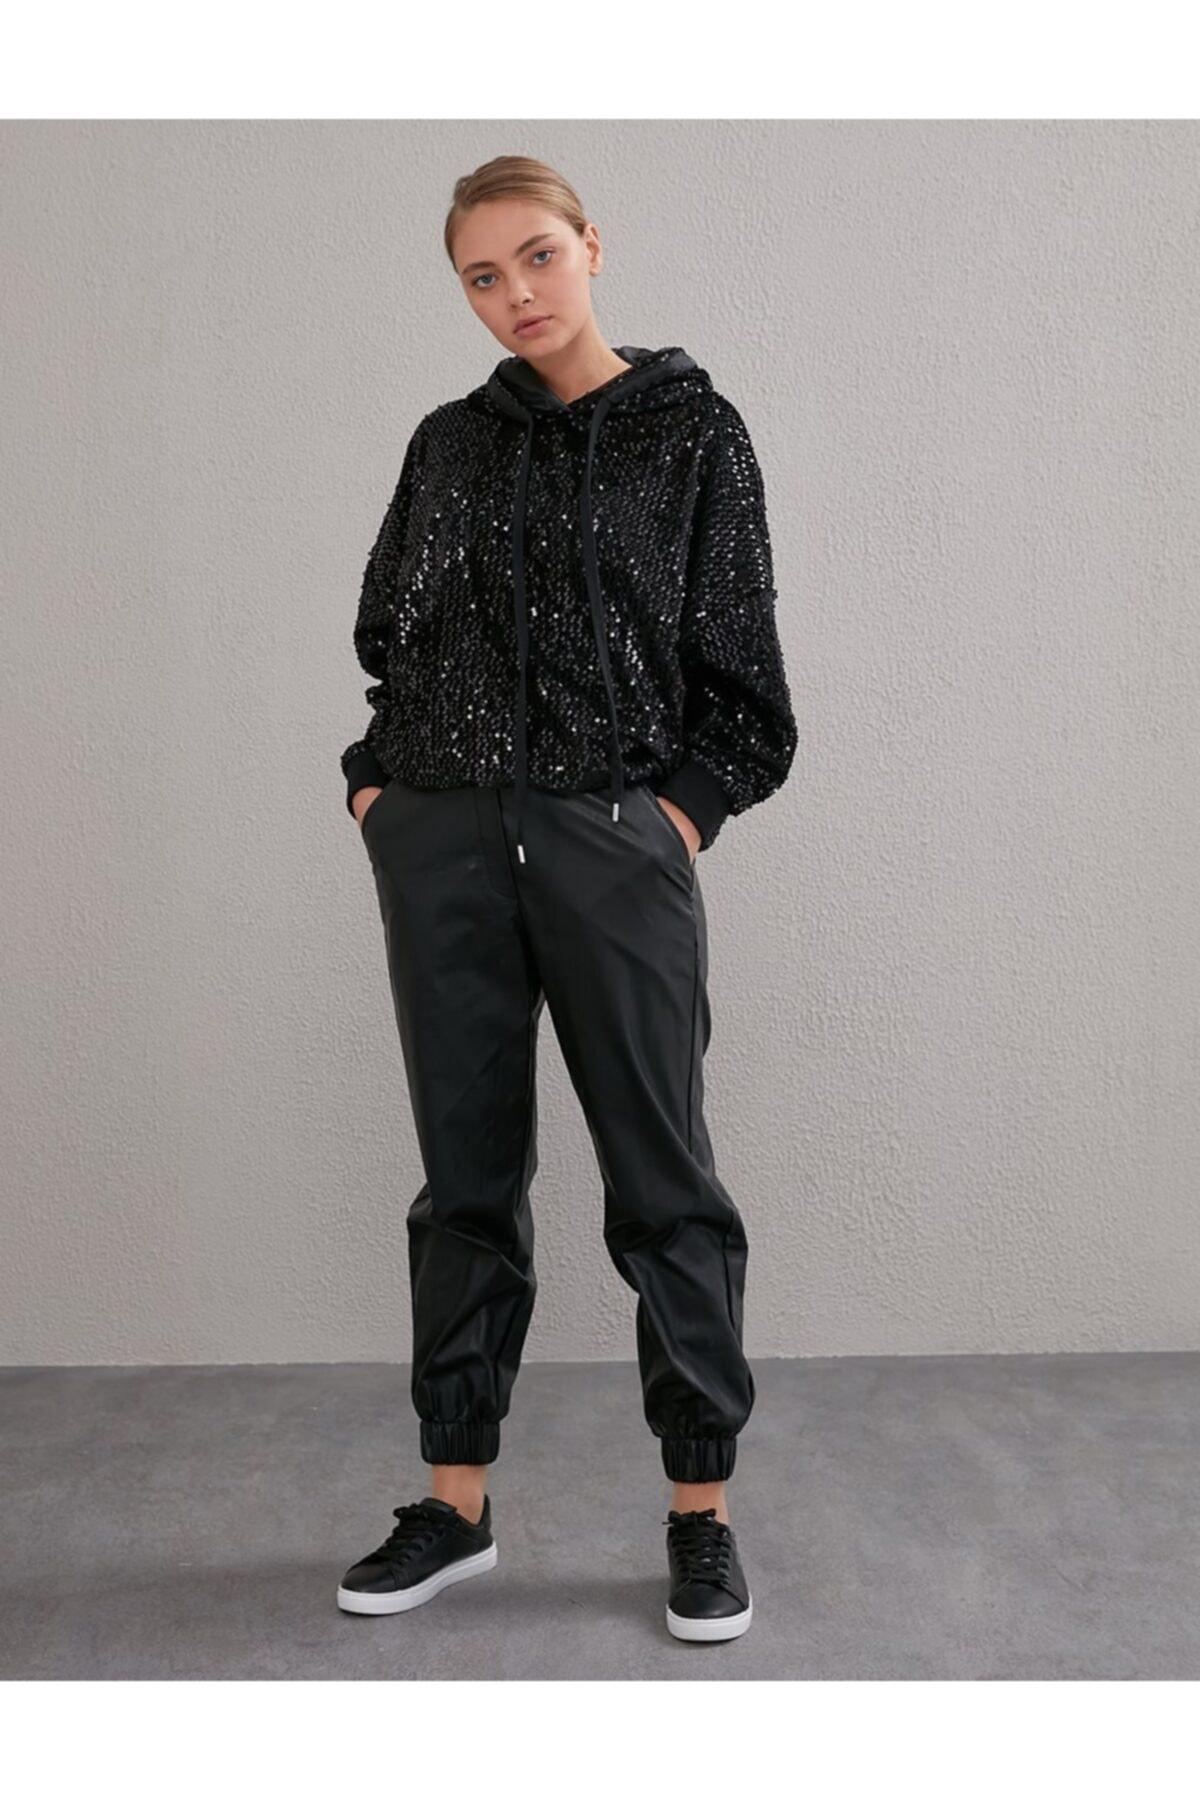 Kayra Beli Lastikli Spor Kesim Deri Pantolon Siyah A20 19115 1